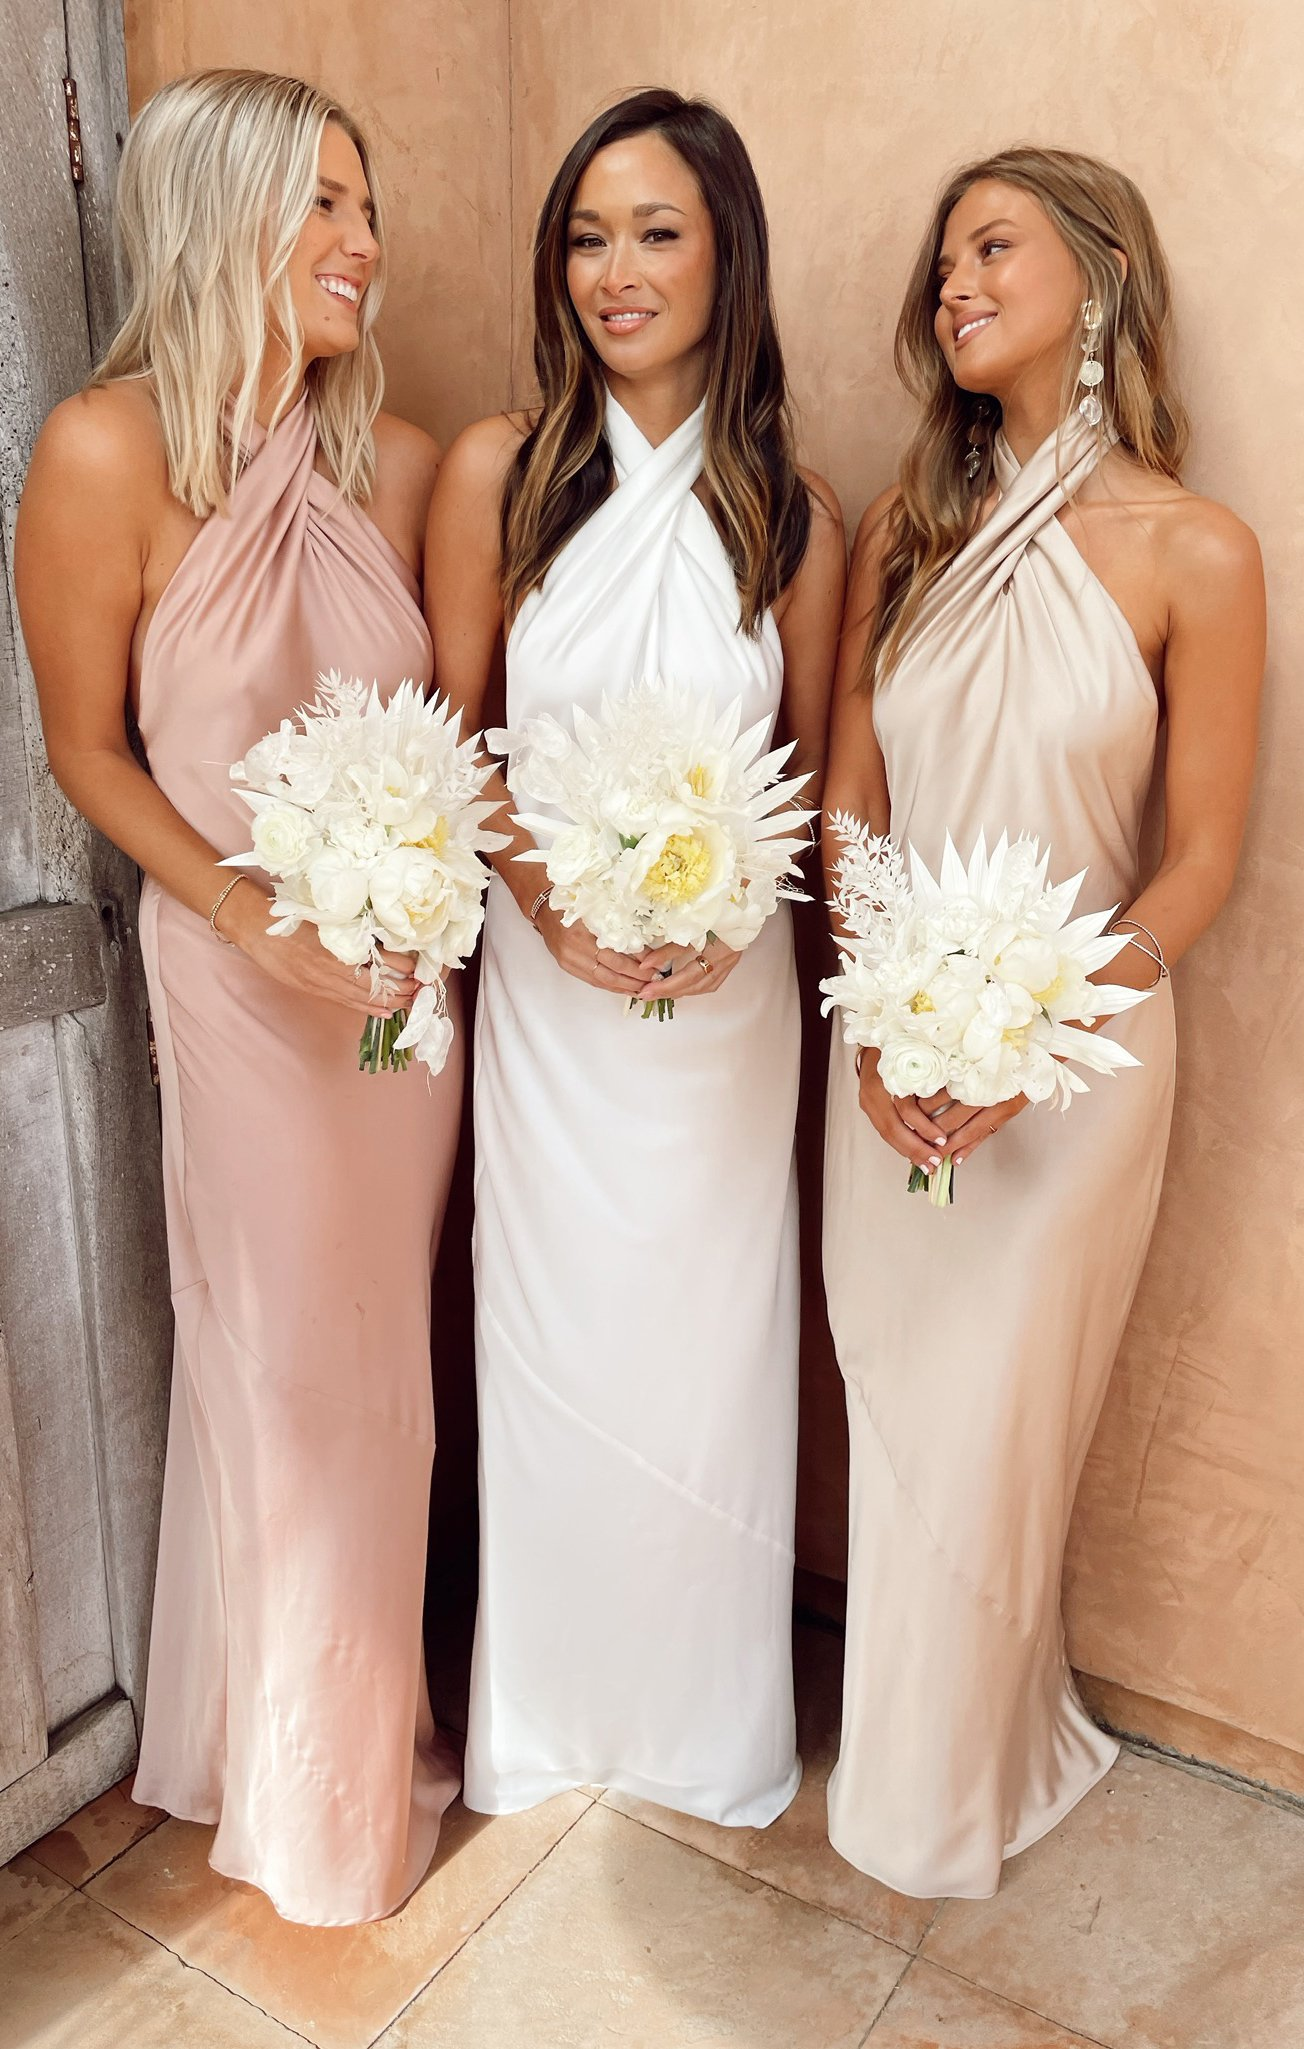 bridesmaid dresses, bridesmaid dress ideas, bridesmaid dress colors, bridesmaid dress styles, affordable bridesmaid dress, satin bridesmaid dresses, halter bridesmaid dress